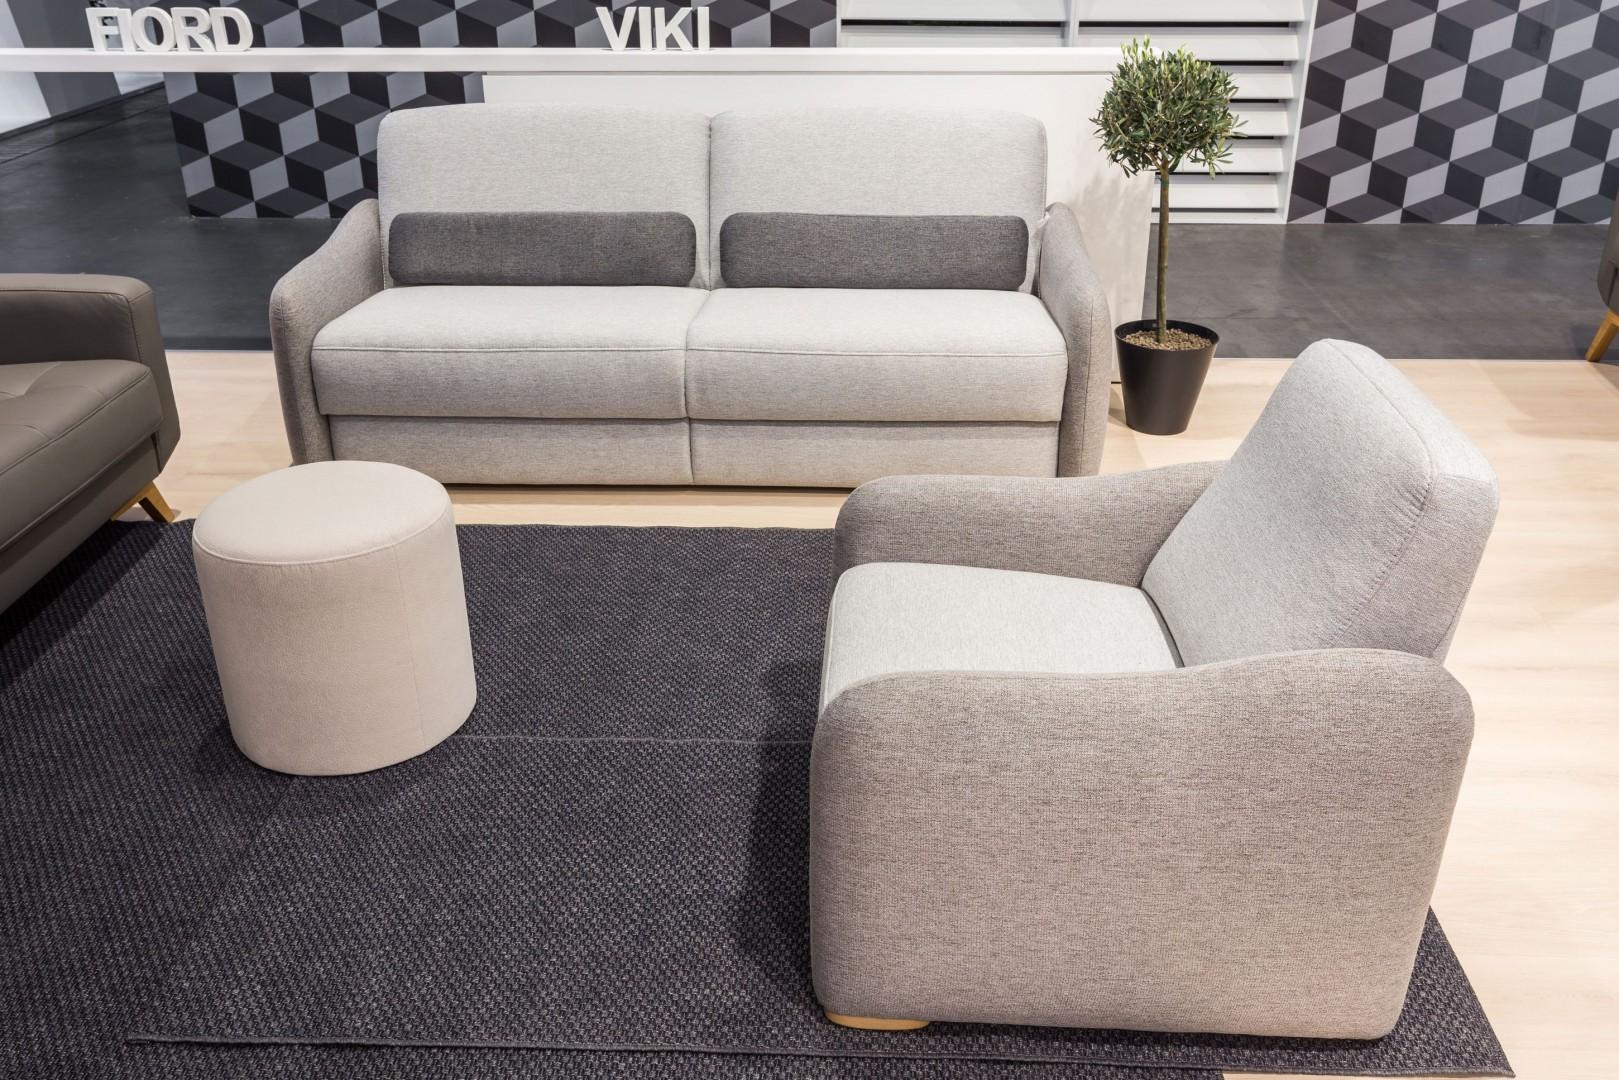 Zestaw (sofa + fotel) Viki marki Sweet Sit. Fot. Gala Collezione